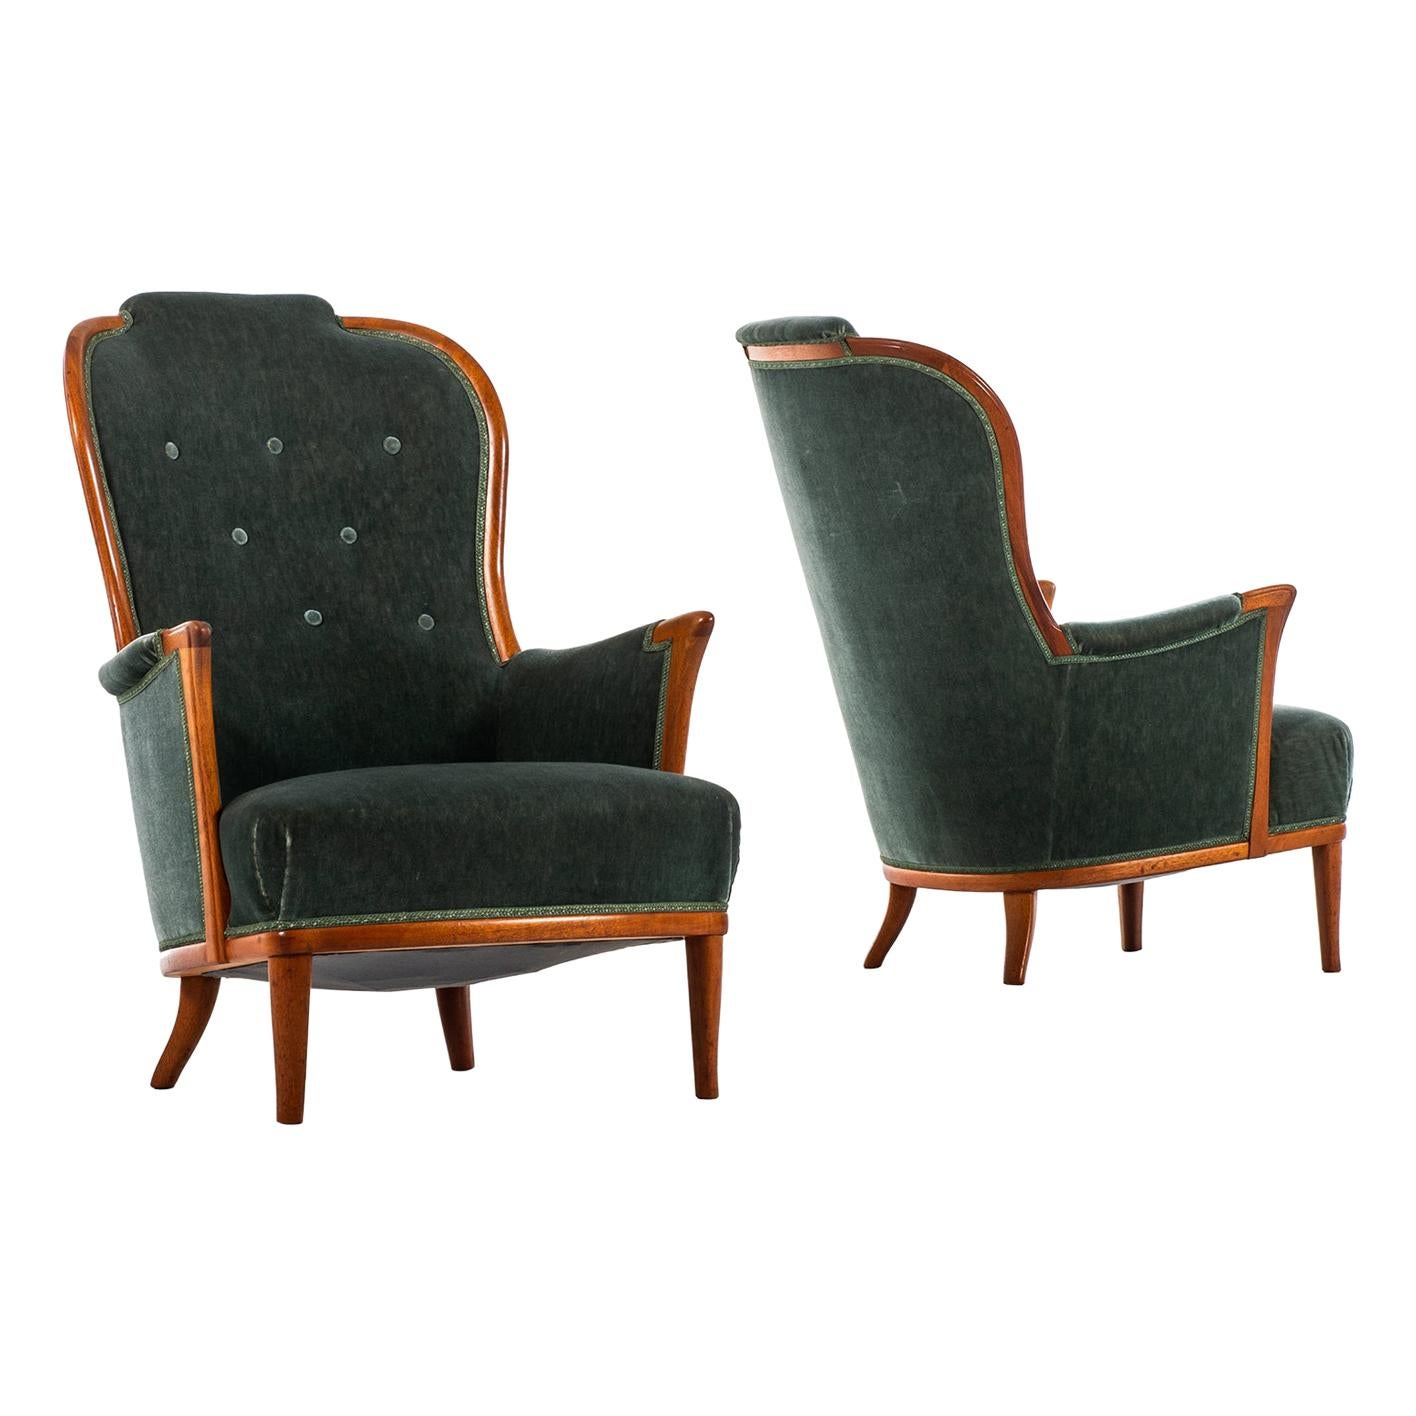 Carl Malmsten Easy Chairs Model Vår Fru Produced by Bodafors in Sweden